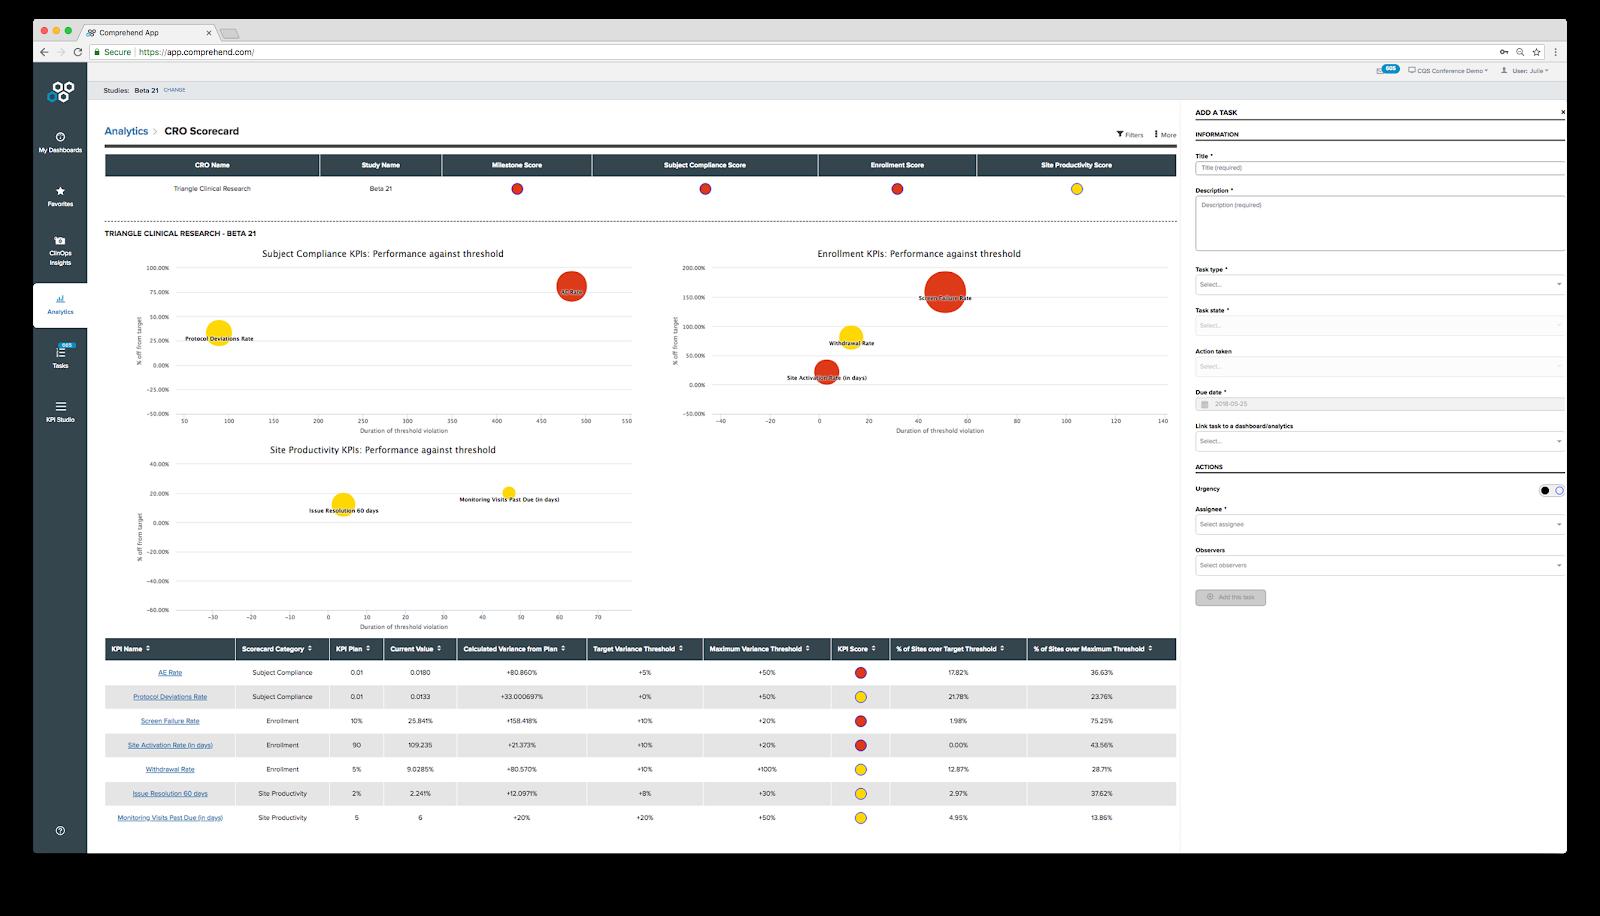 Analytics-CRO-Scorecard